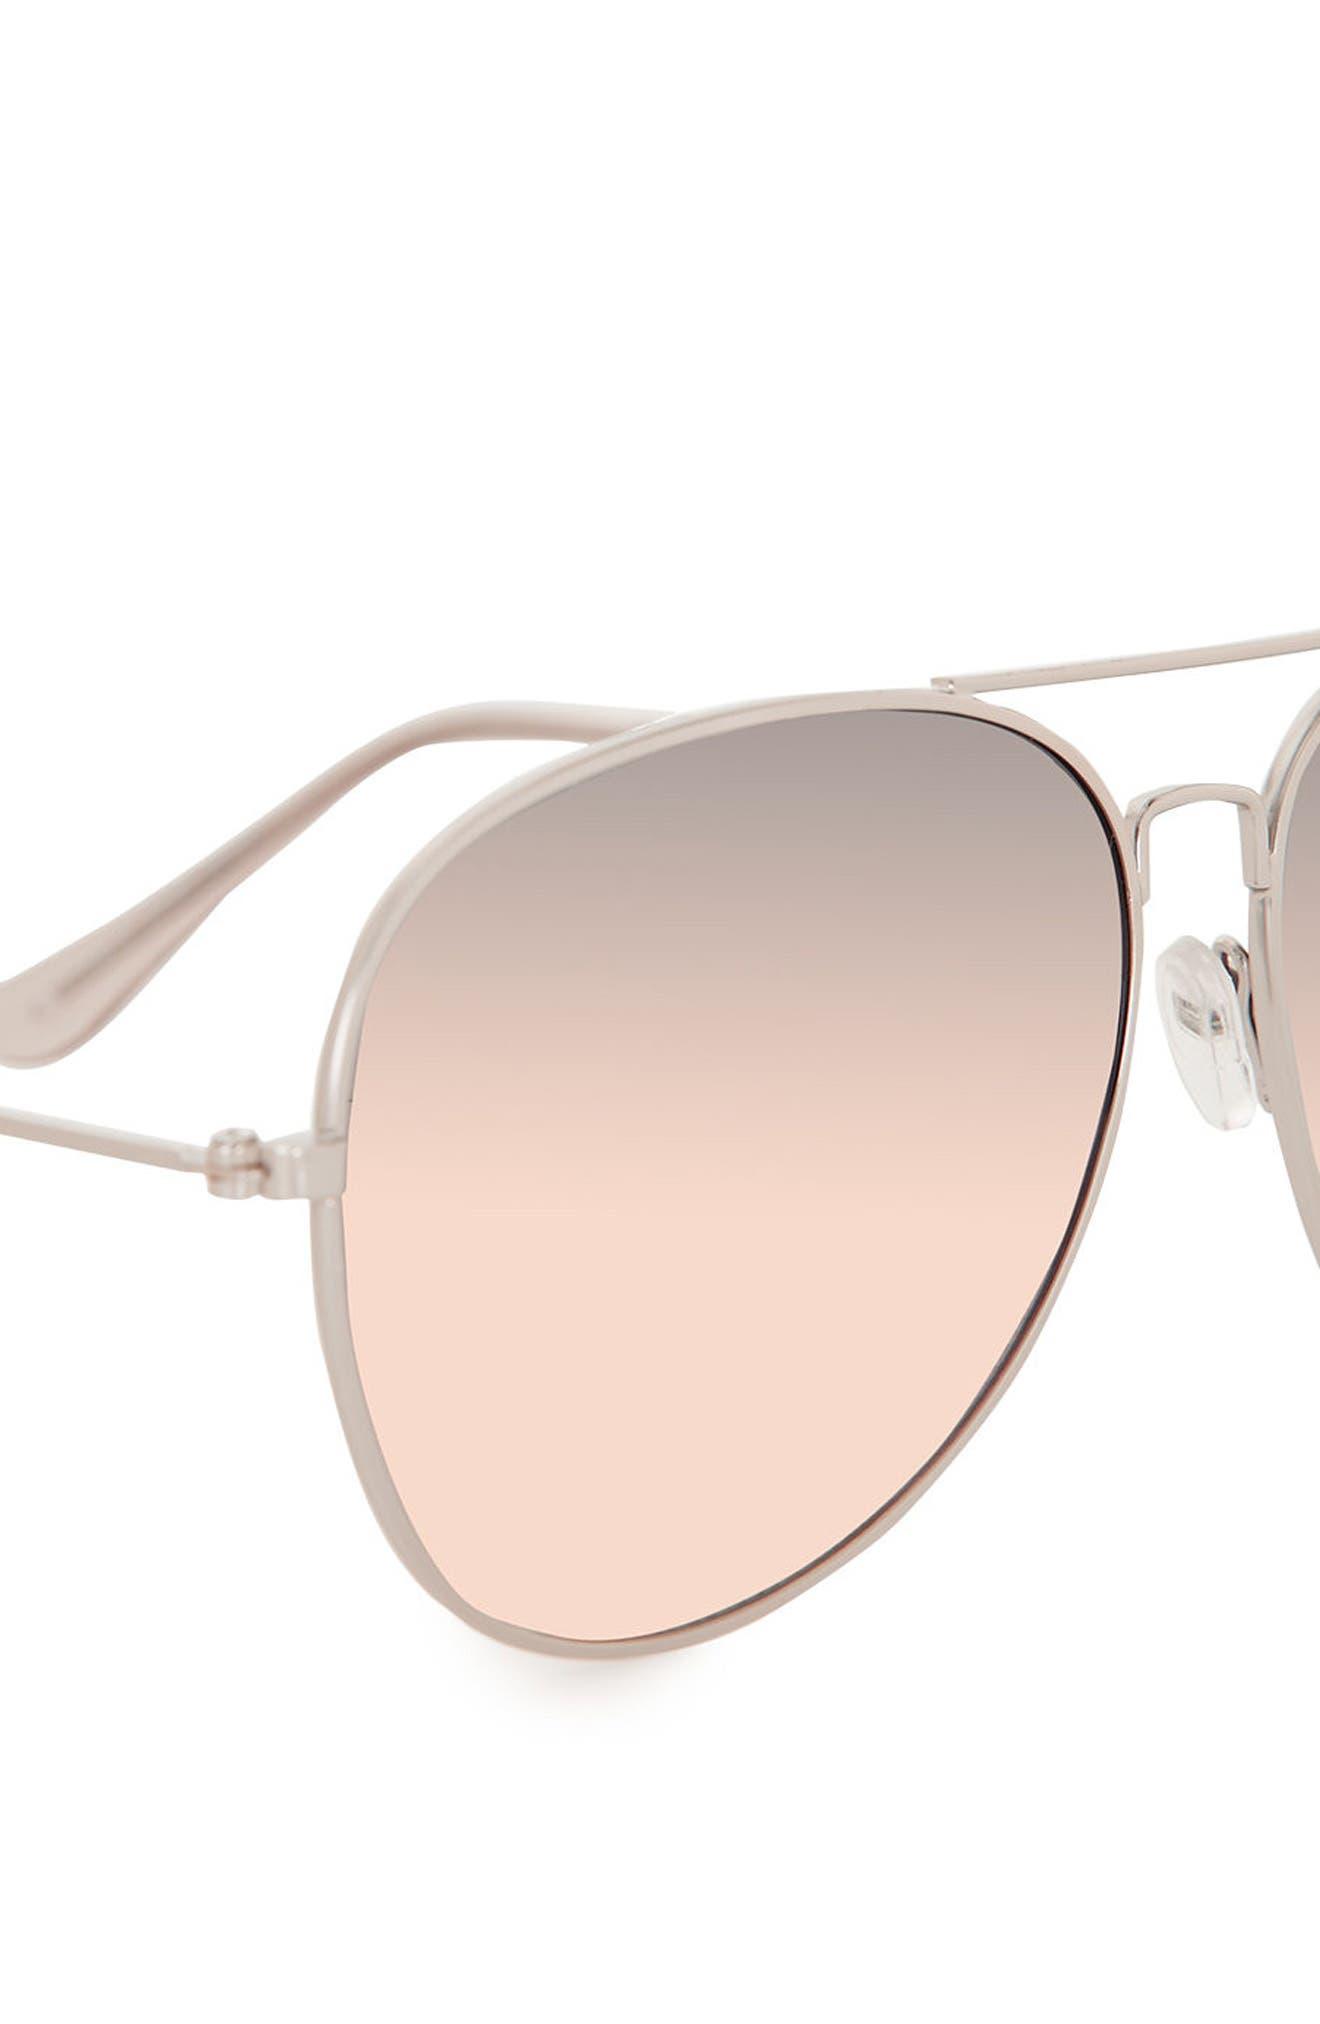 58mm Mirrored Aviator Sunglasses,                             Alternate thumbnail 3, color,                             Metallic Silver